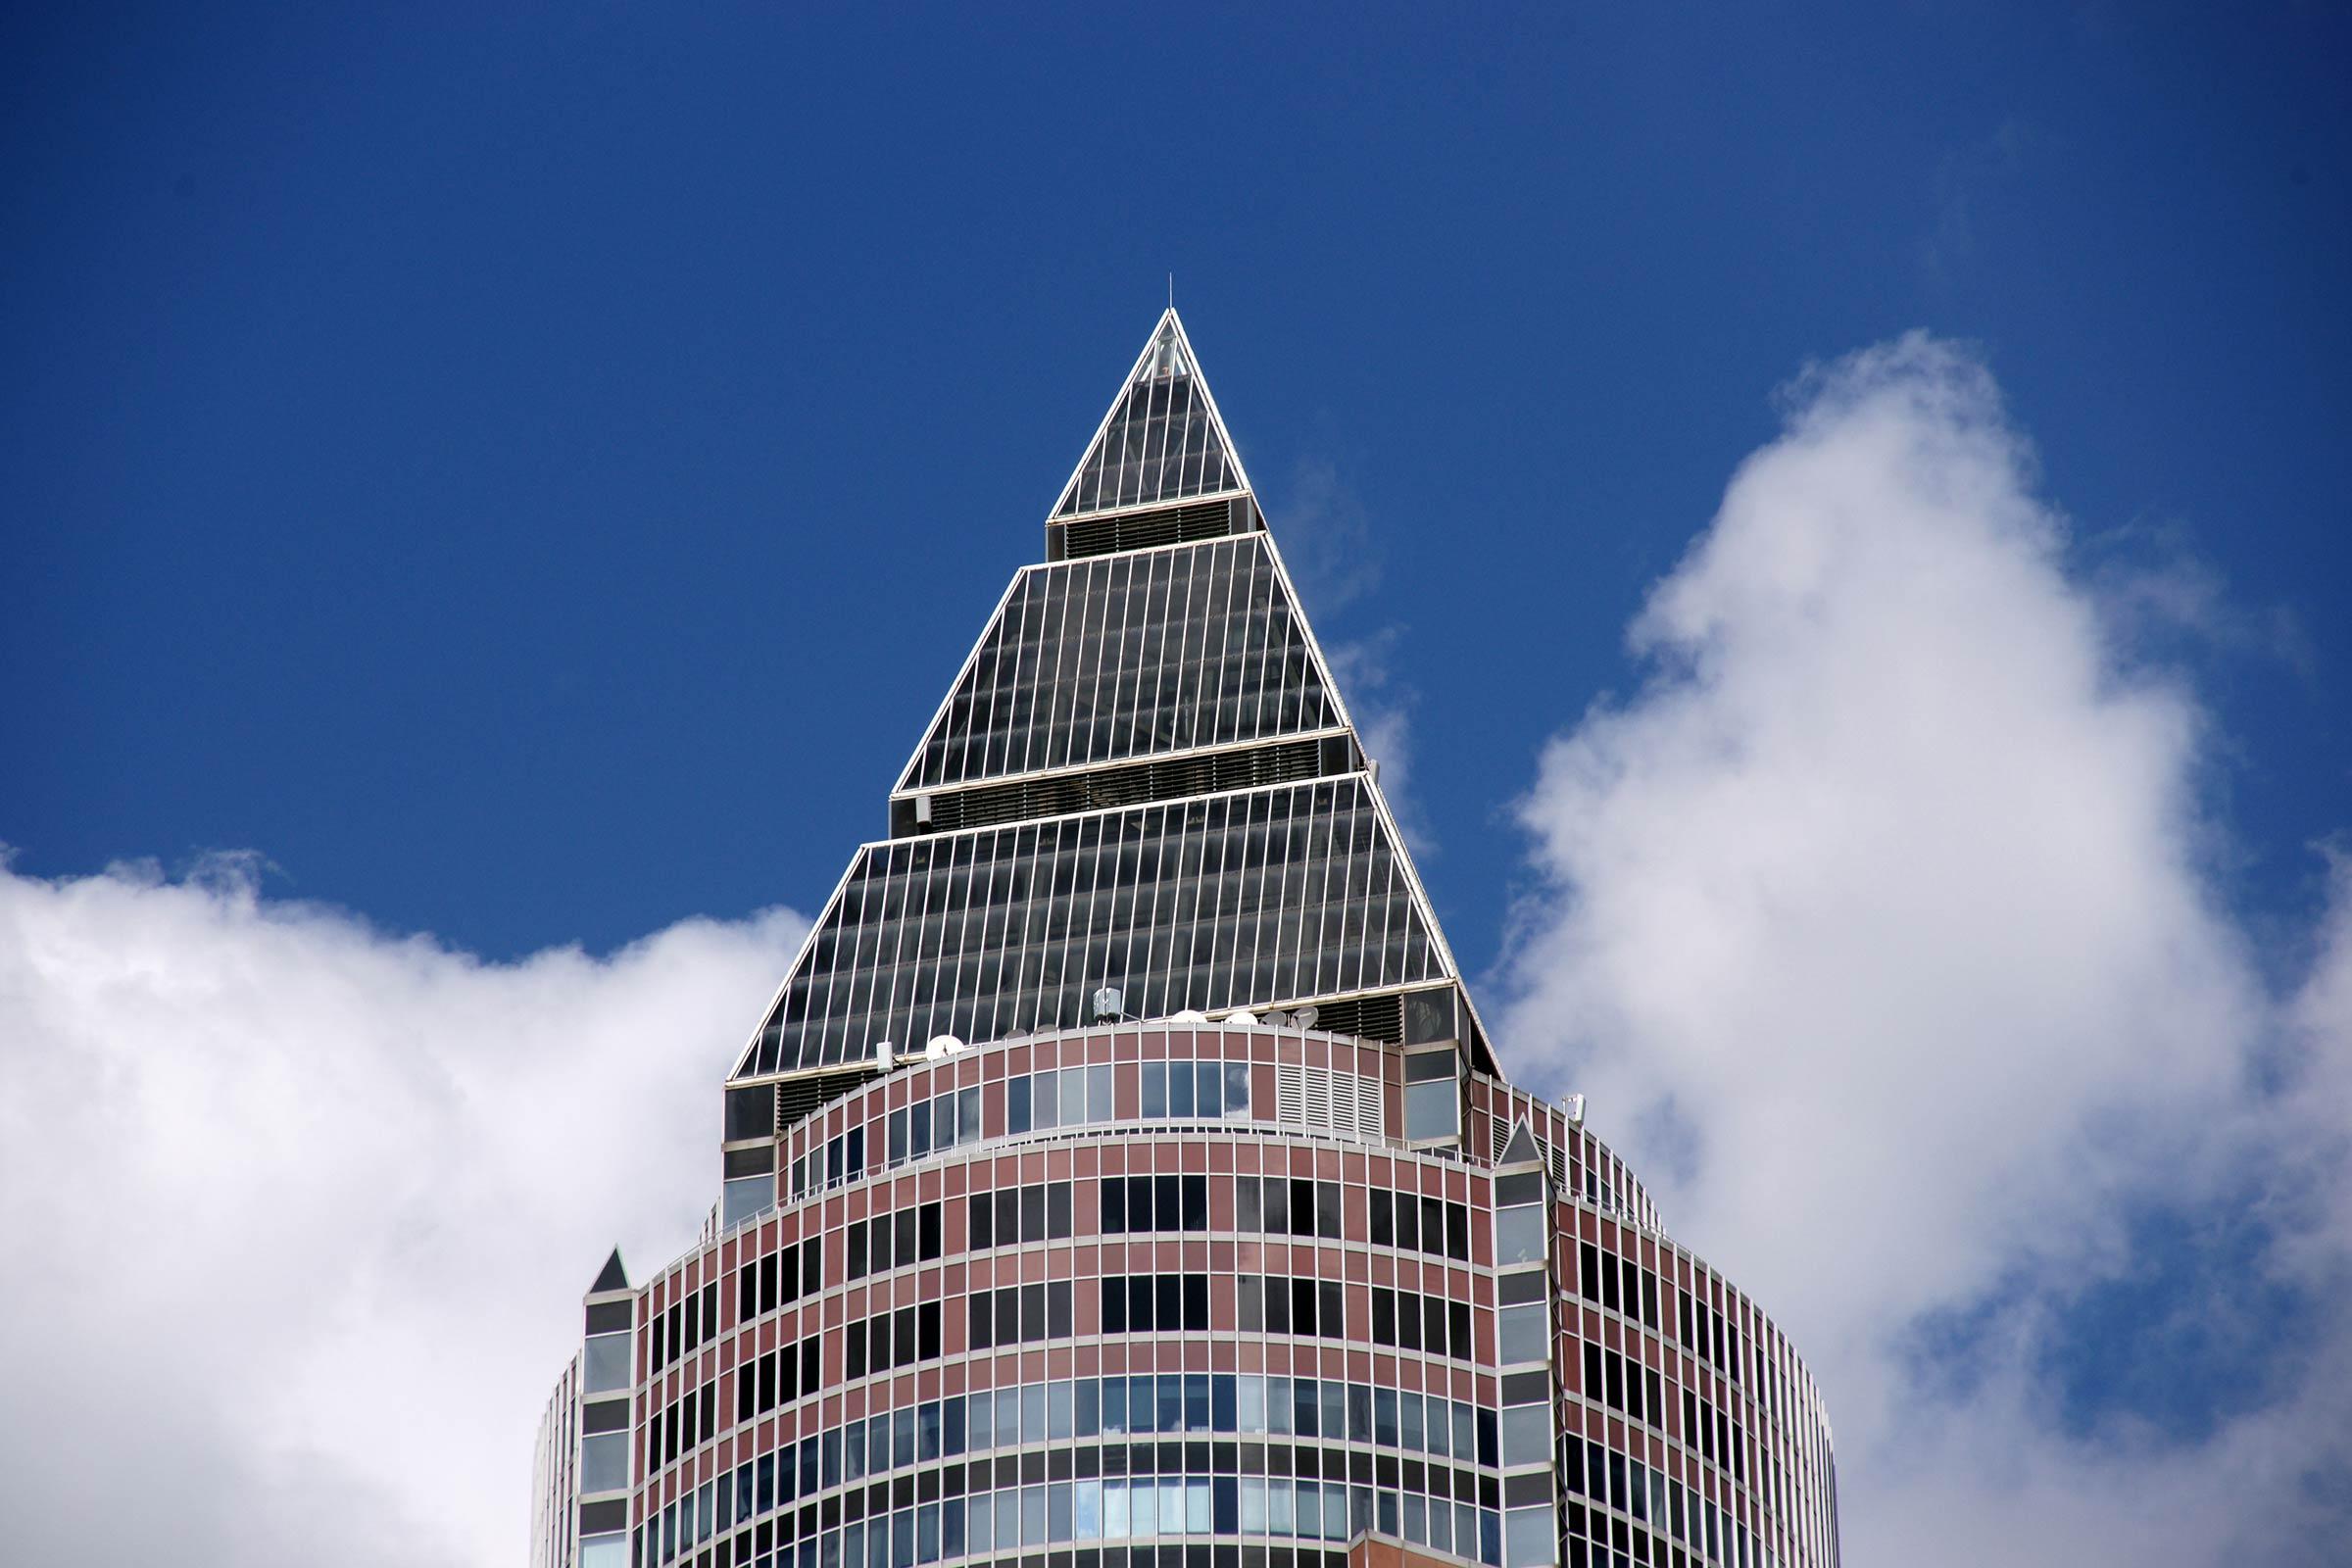 MesseTurm Spitze - Fassade und Turmspitze vom MesseTurm in Frankfurt am Main